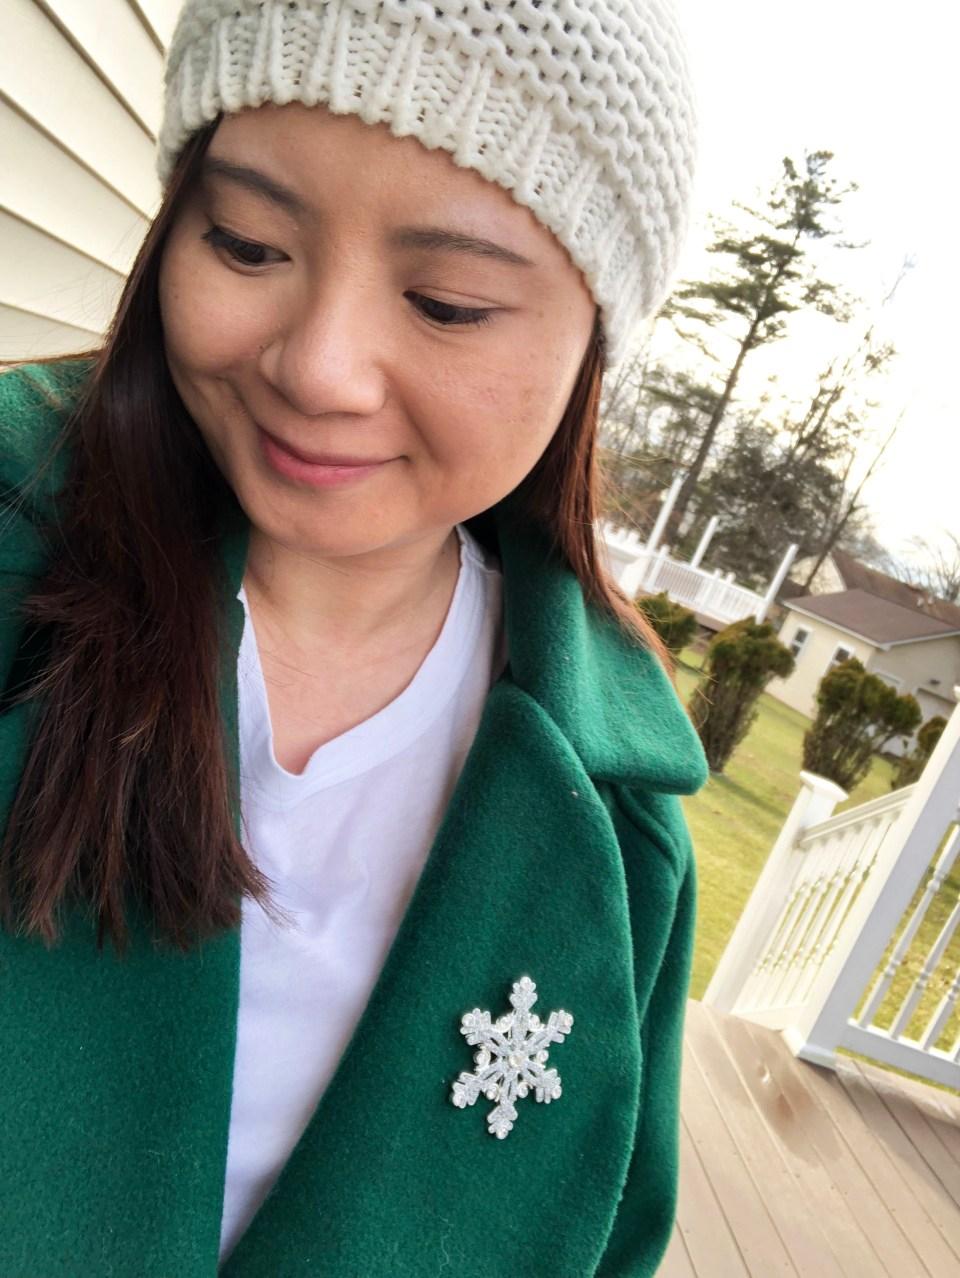 Green Lapel Coat + Snowflake Brooch 7